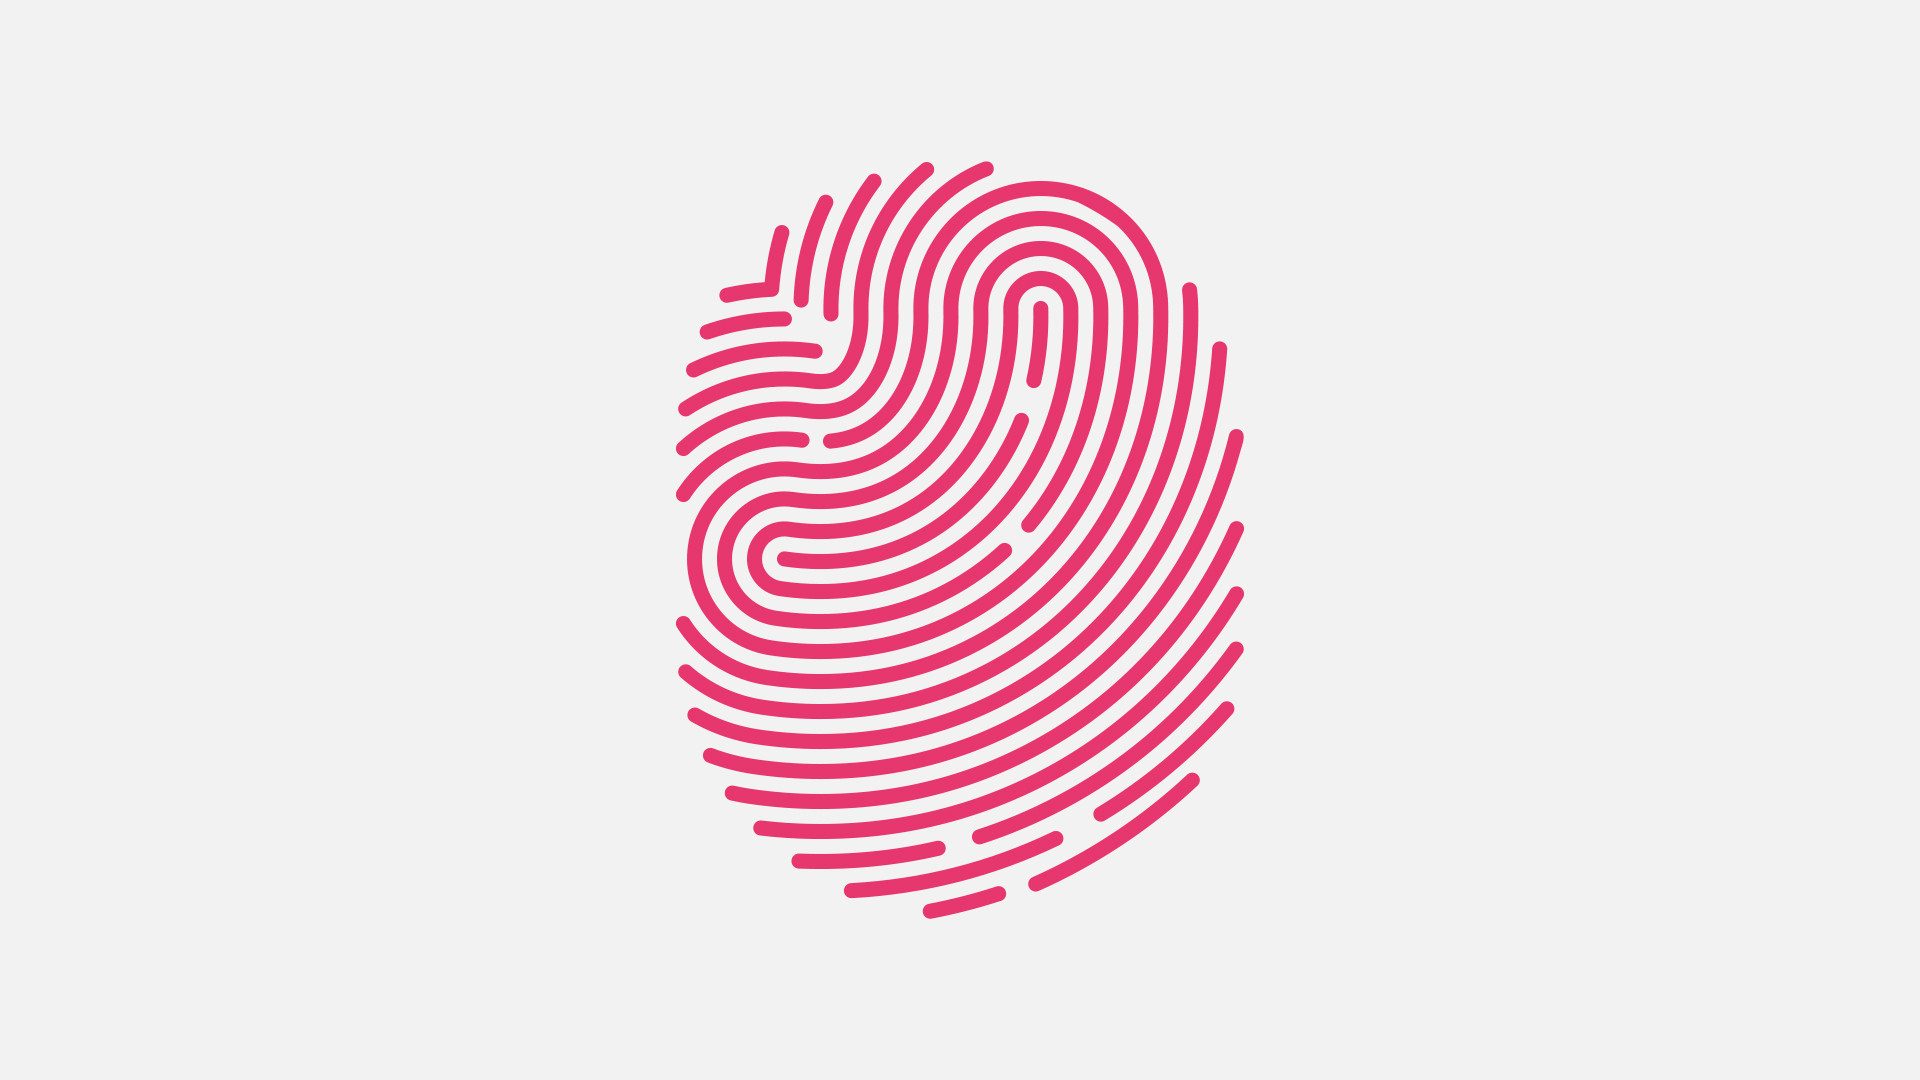 VOI (Verification of Identity)